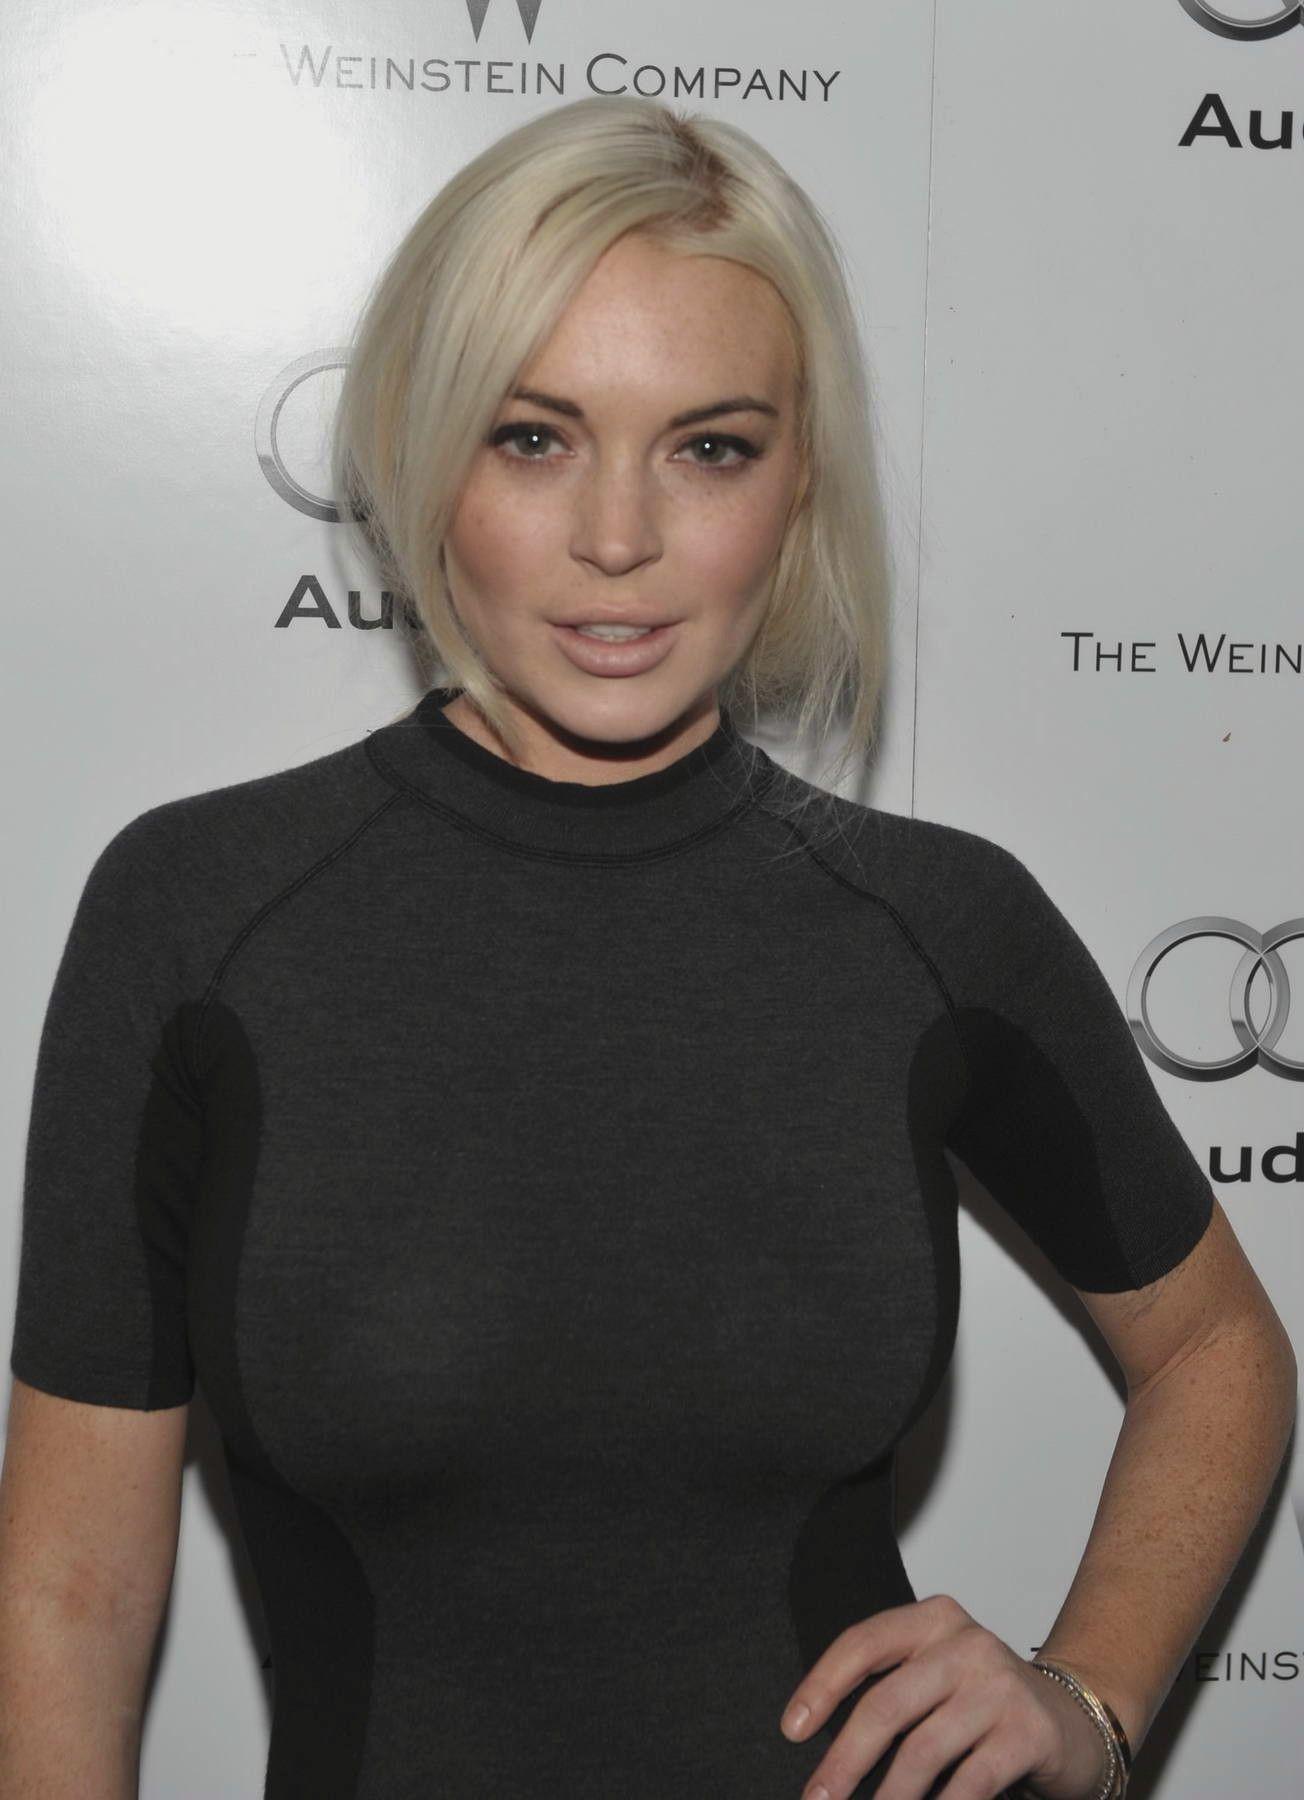 STARS WALLPAPER Lindsay Lohan Wallpapers-STARS WALLPAPER Lindsay Lohan Wallpapers Free Download-16